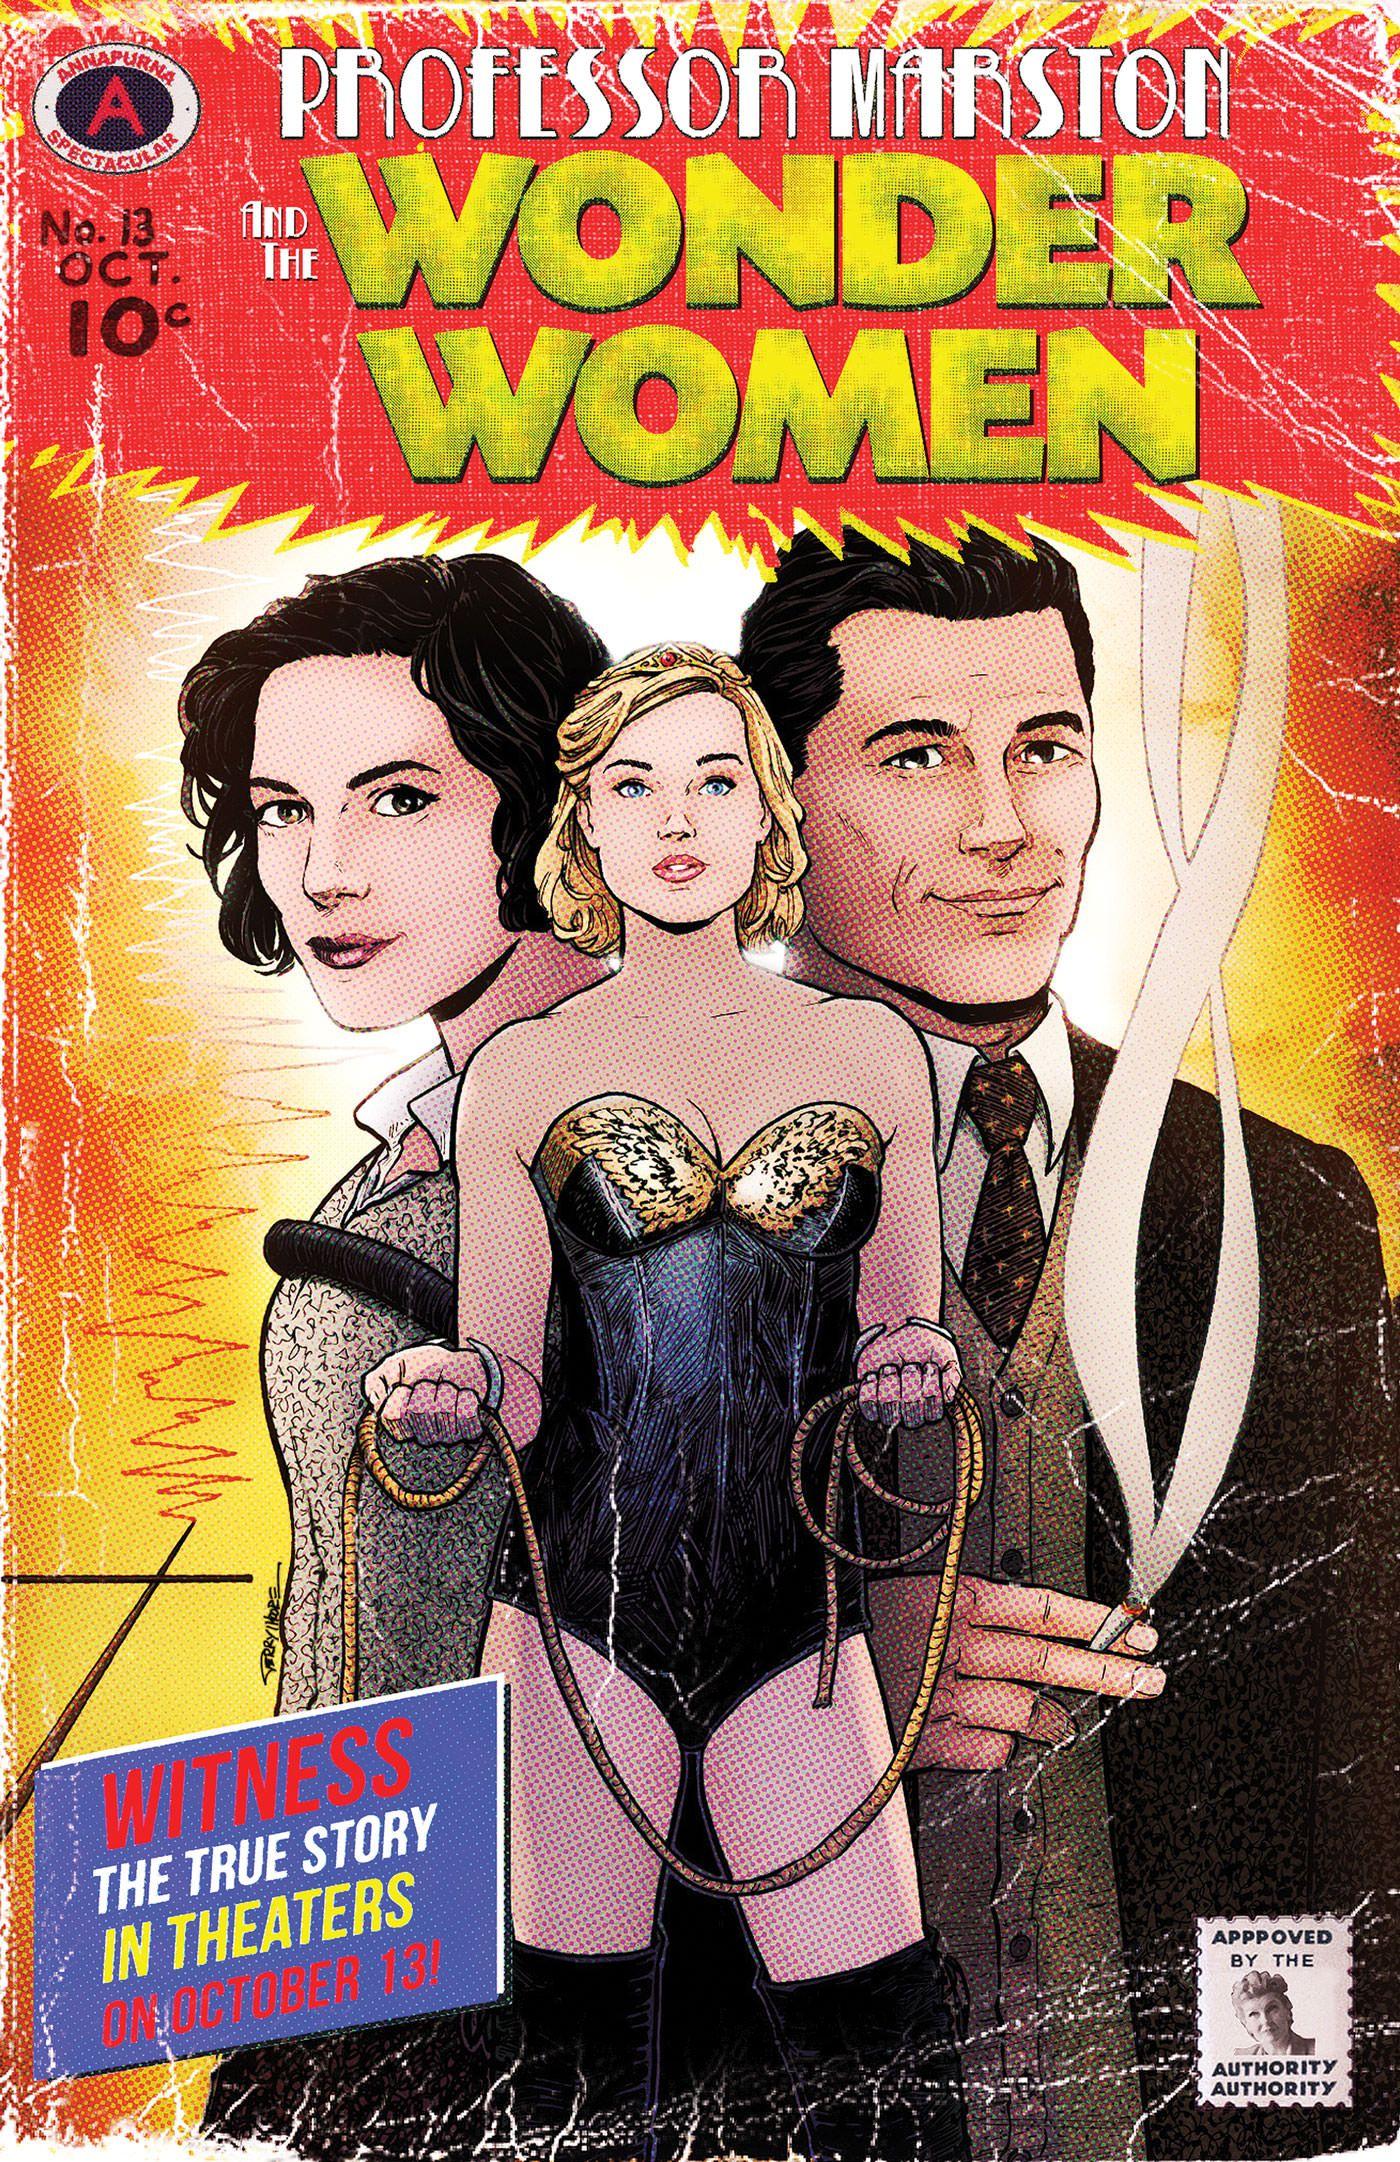 Professor Marston And The Wonder Women New Trailer And Poster Https Teaser Trailer Com Movie Professor Marsto Wonder Woman Comic Wonder Woman New Poster